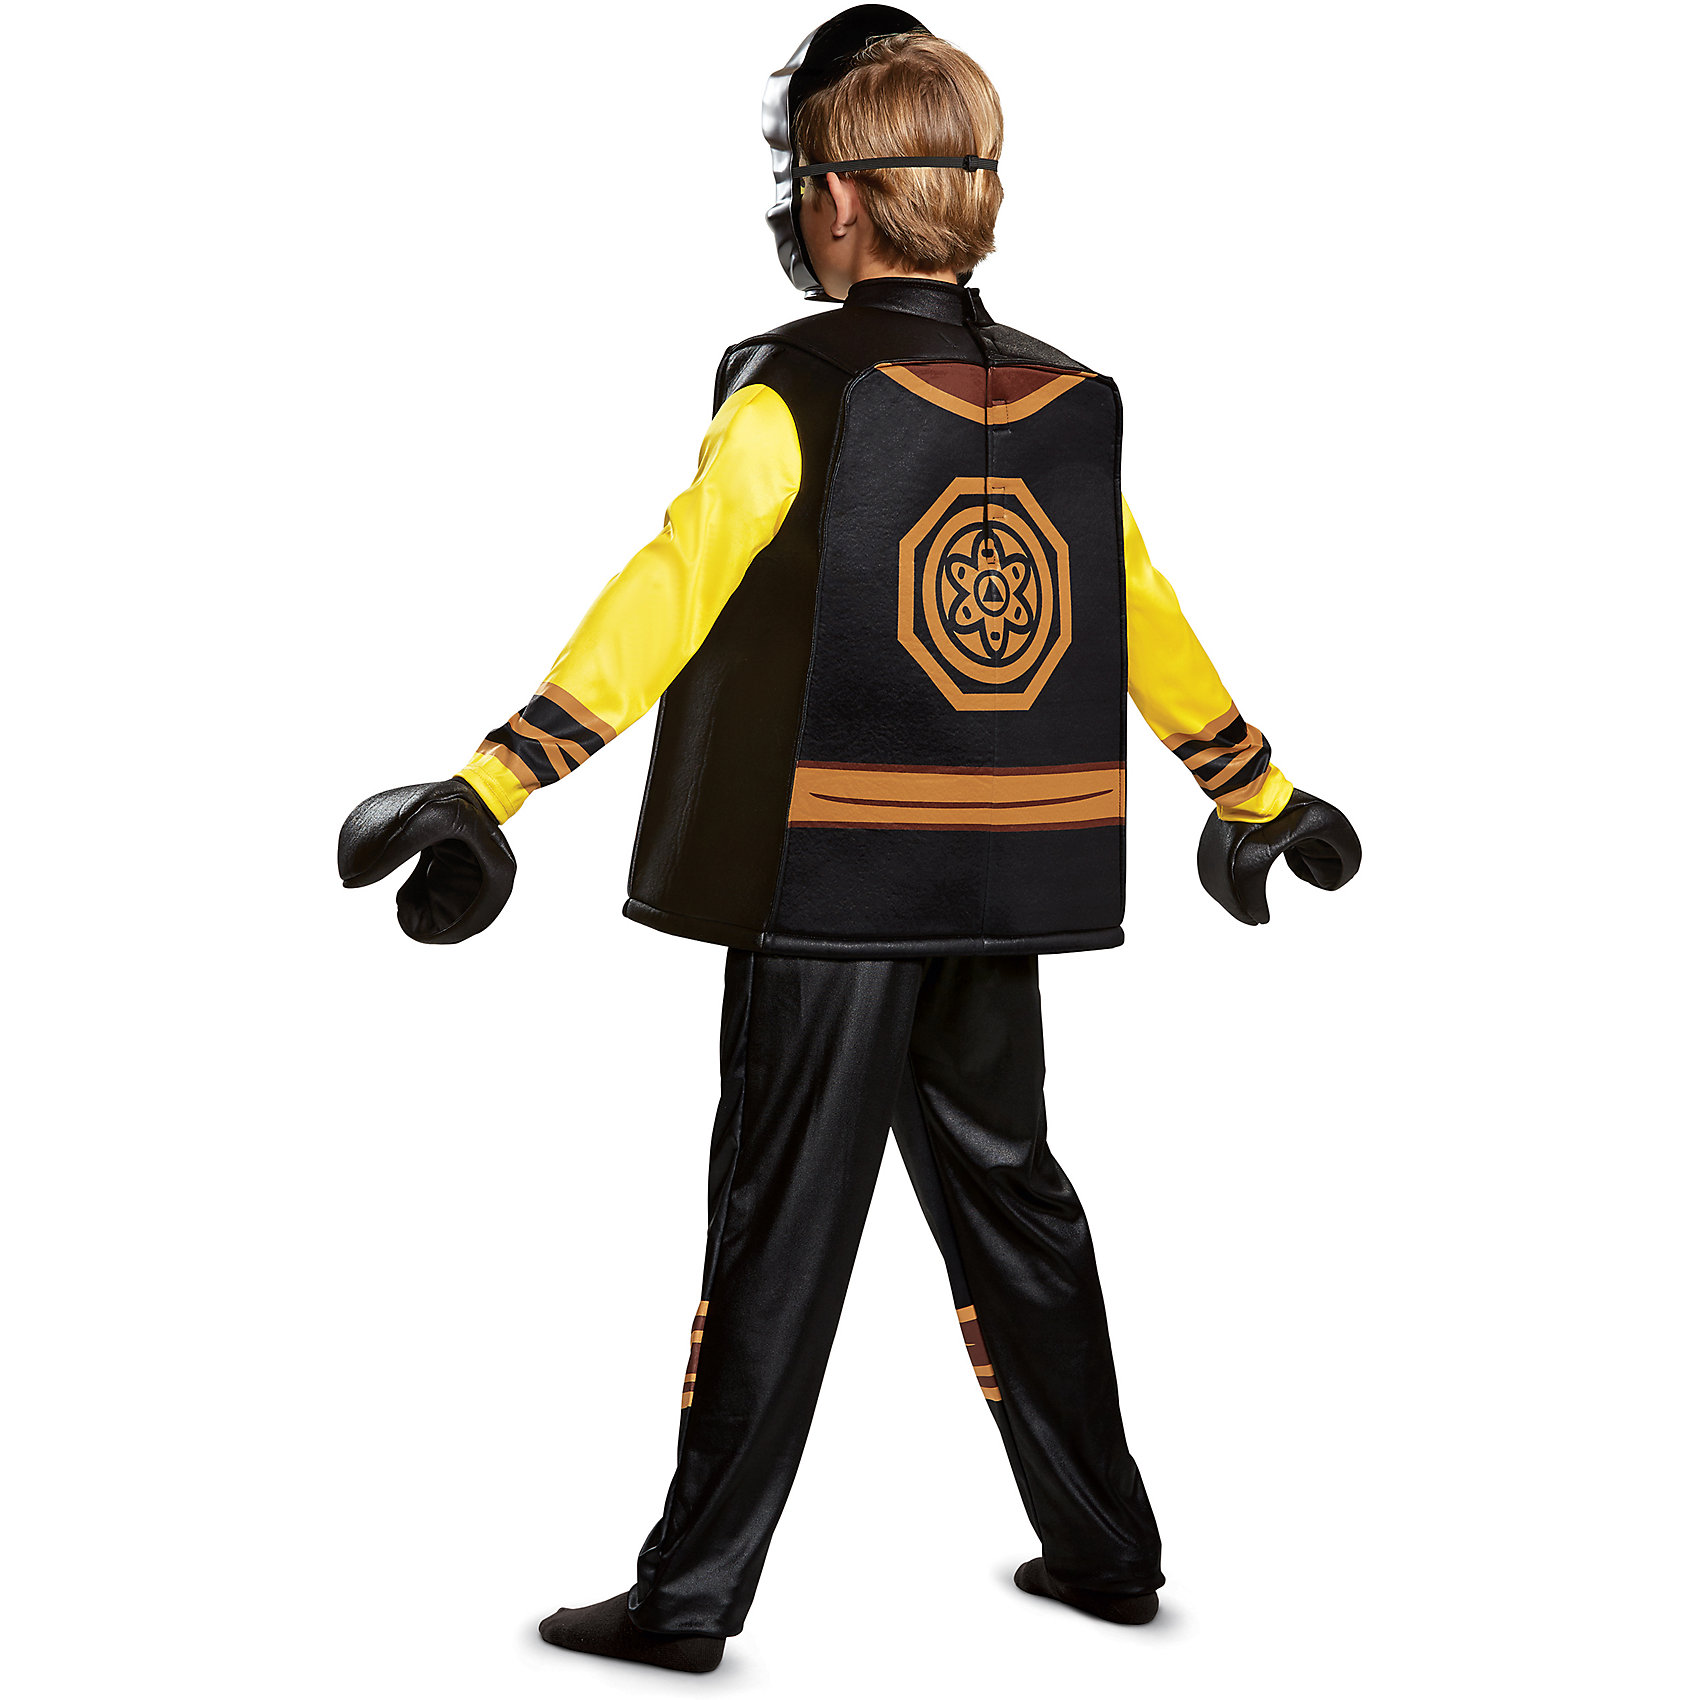 Neu LEGO Kostüm LEGO Ninjago Cole Movie Deluxe, 5-tlg. 5-tlg. 5-tlg. 6846678 | Stilvoll und lustig  3b8201